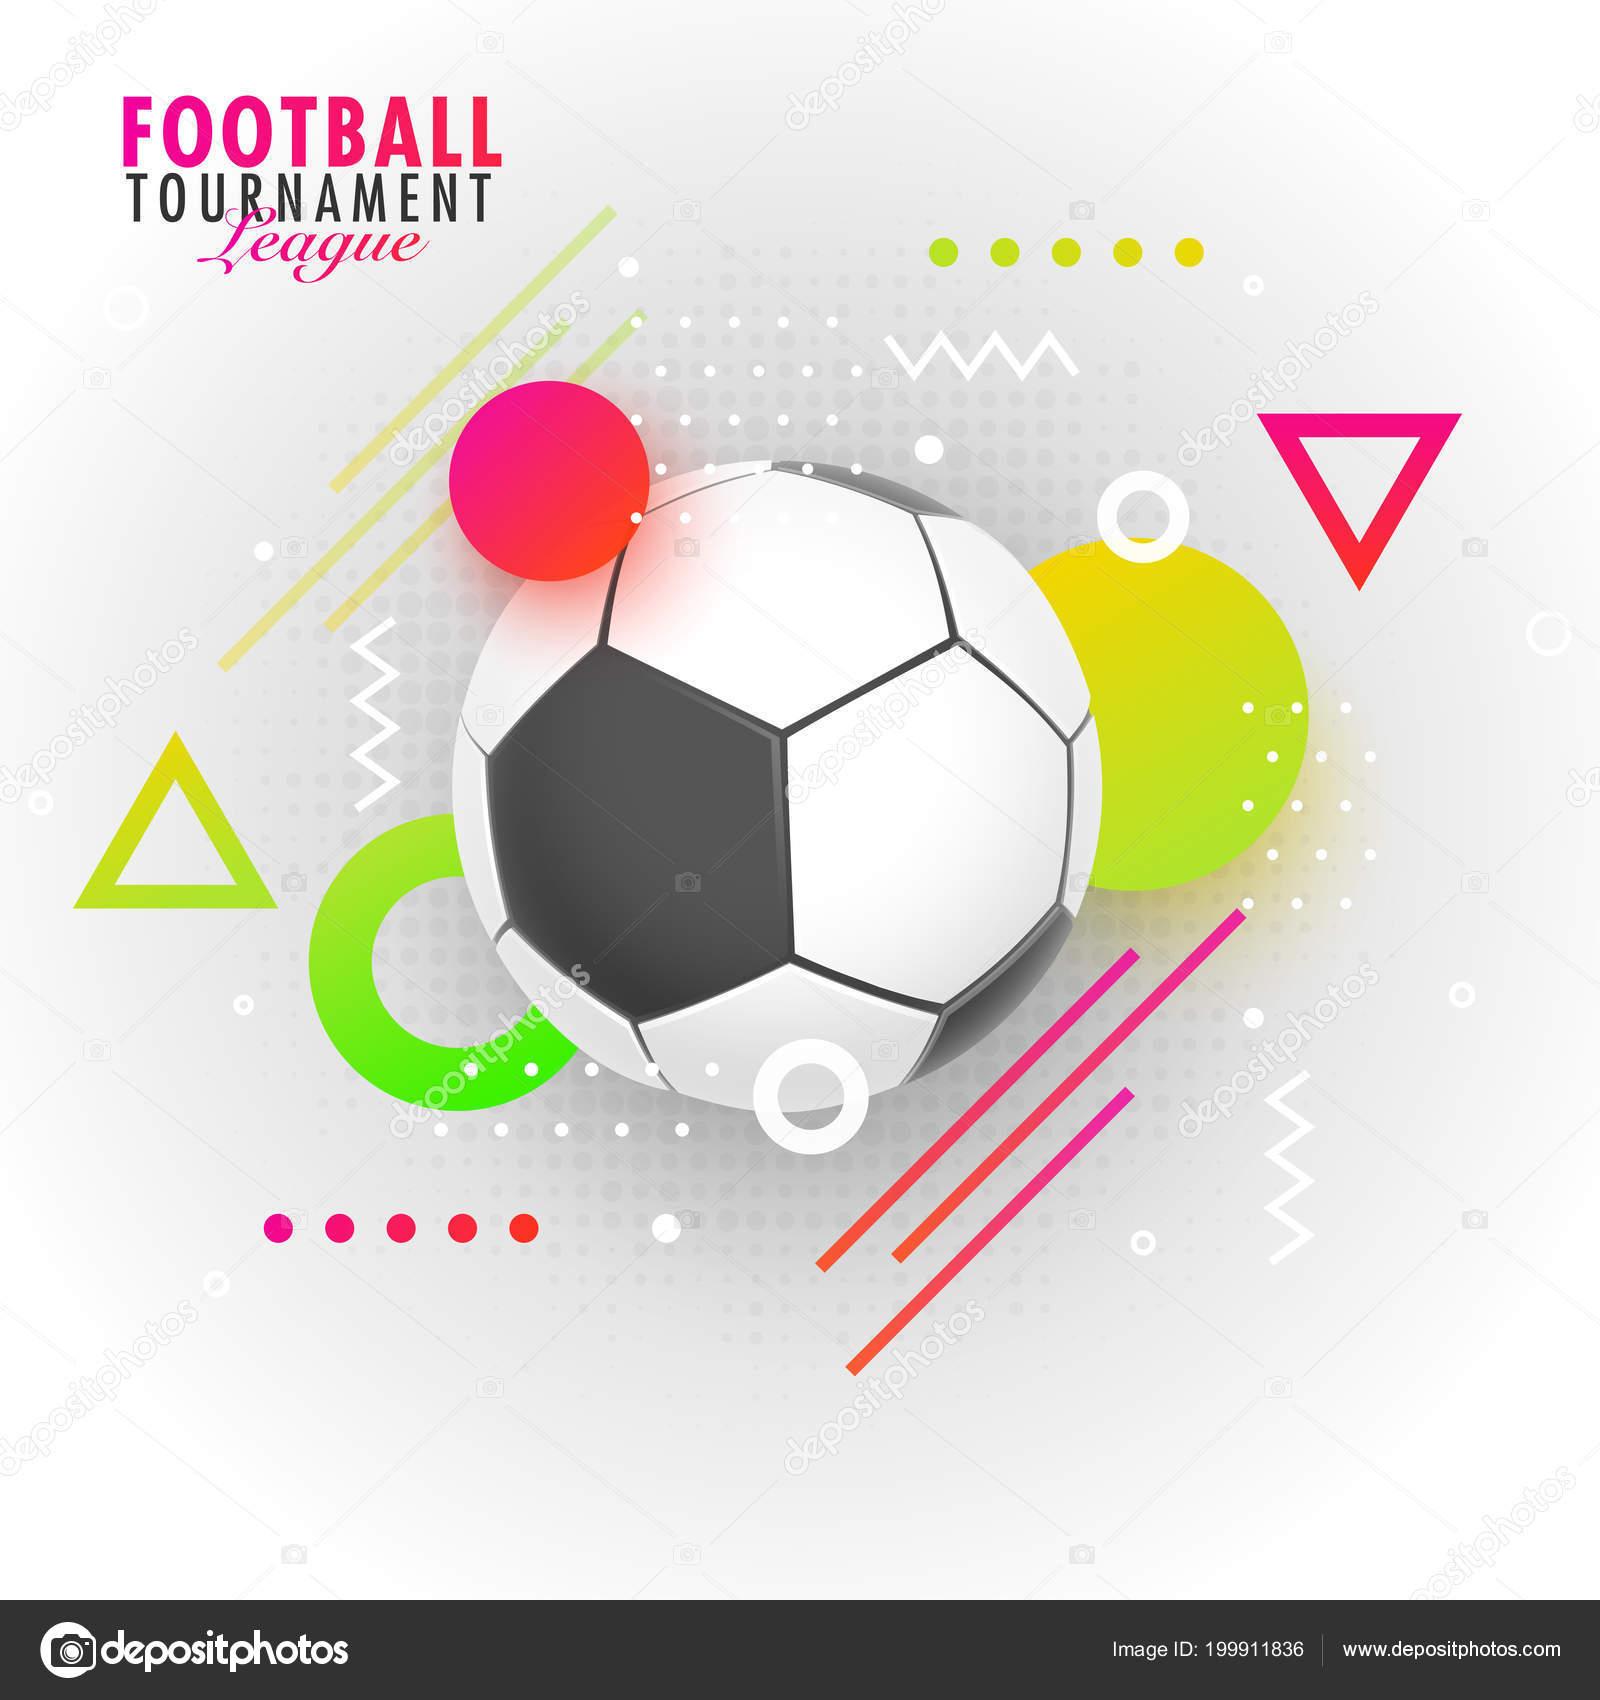 Football Tournament League Text Football Abstract Background Banner Poster Design Stock Vector C Alliesinteract 199911836